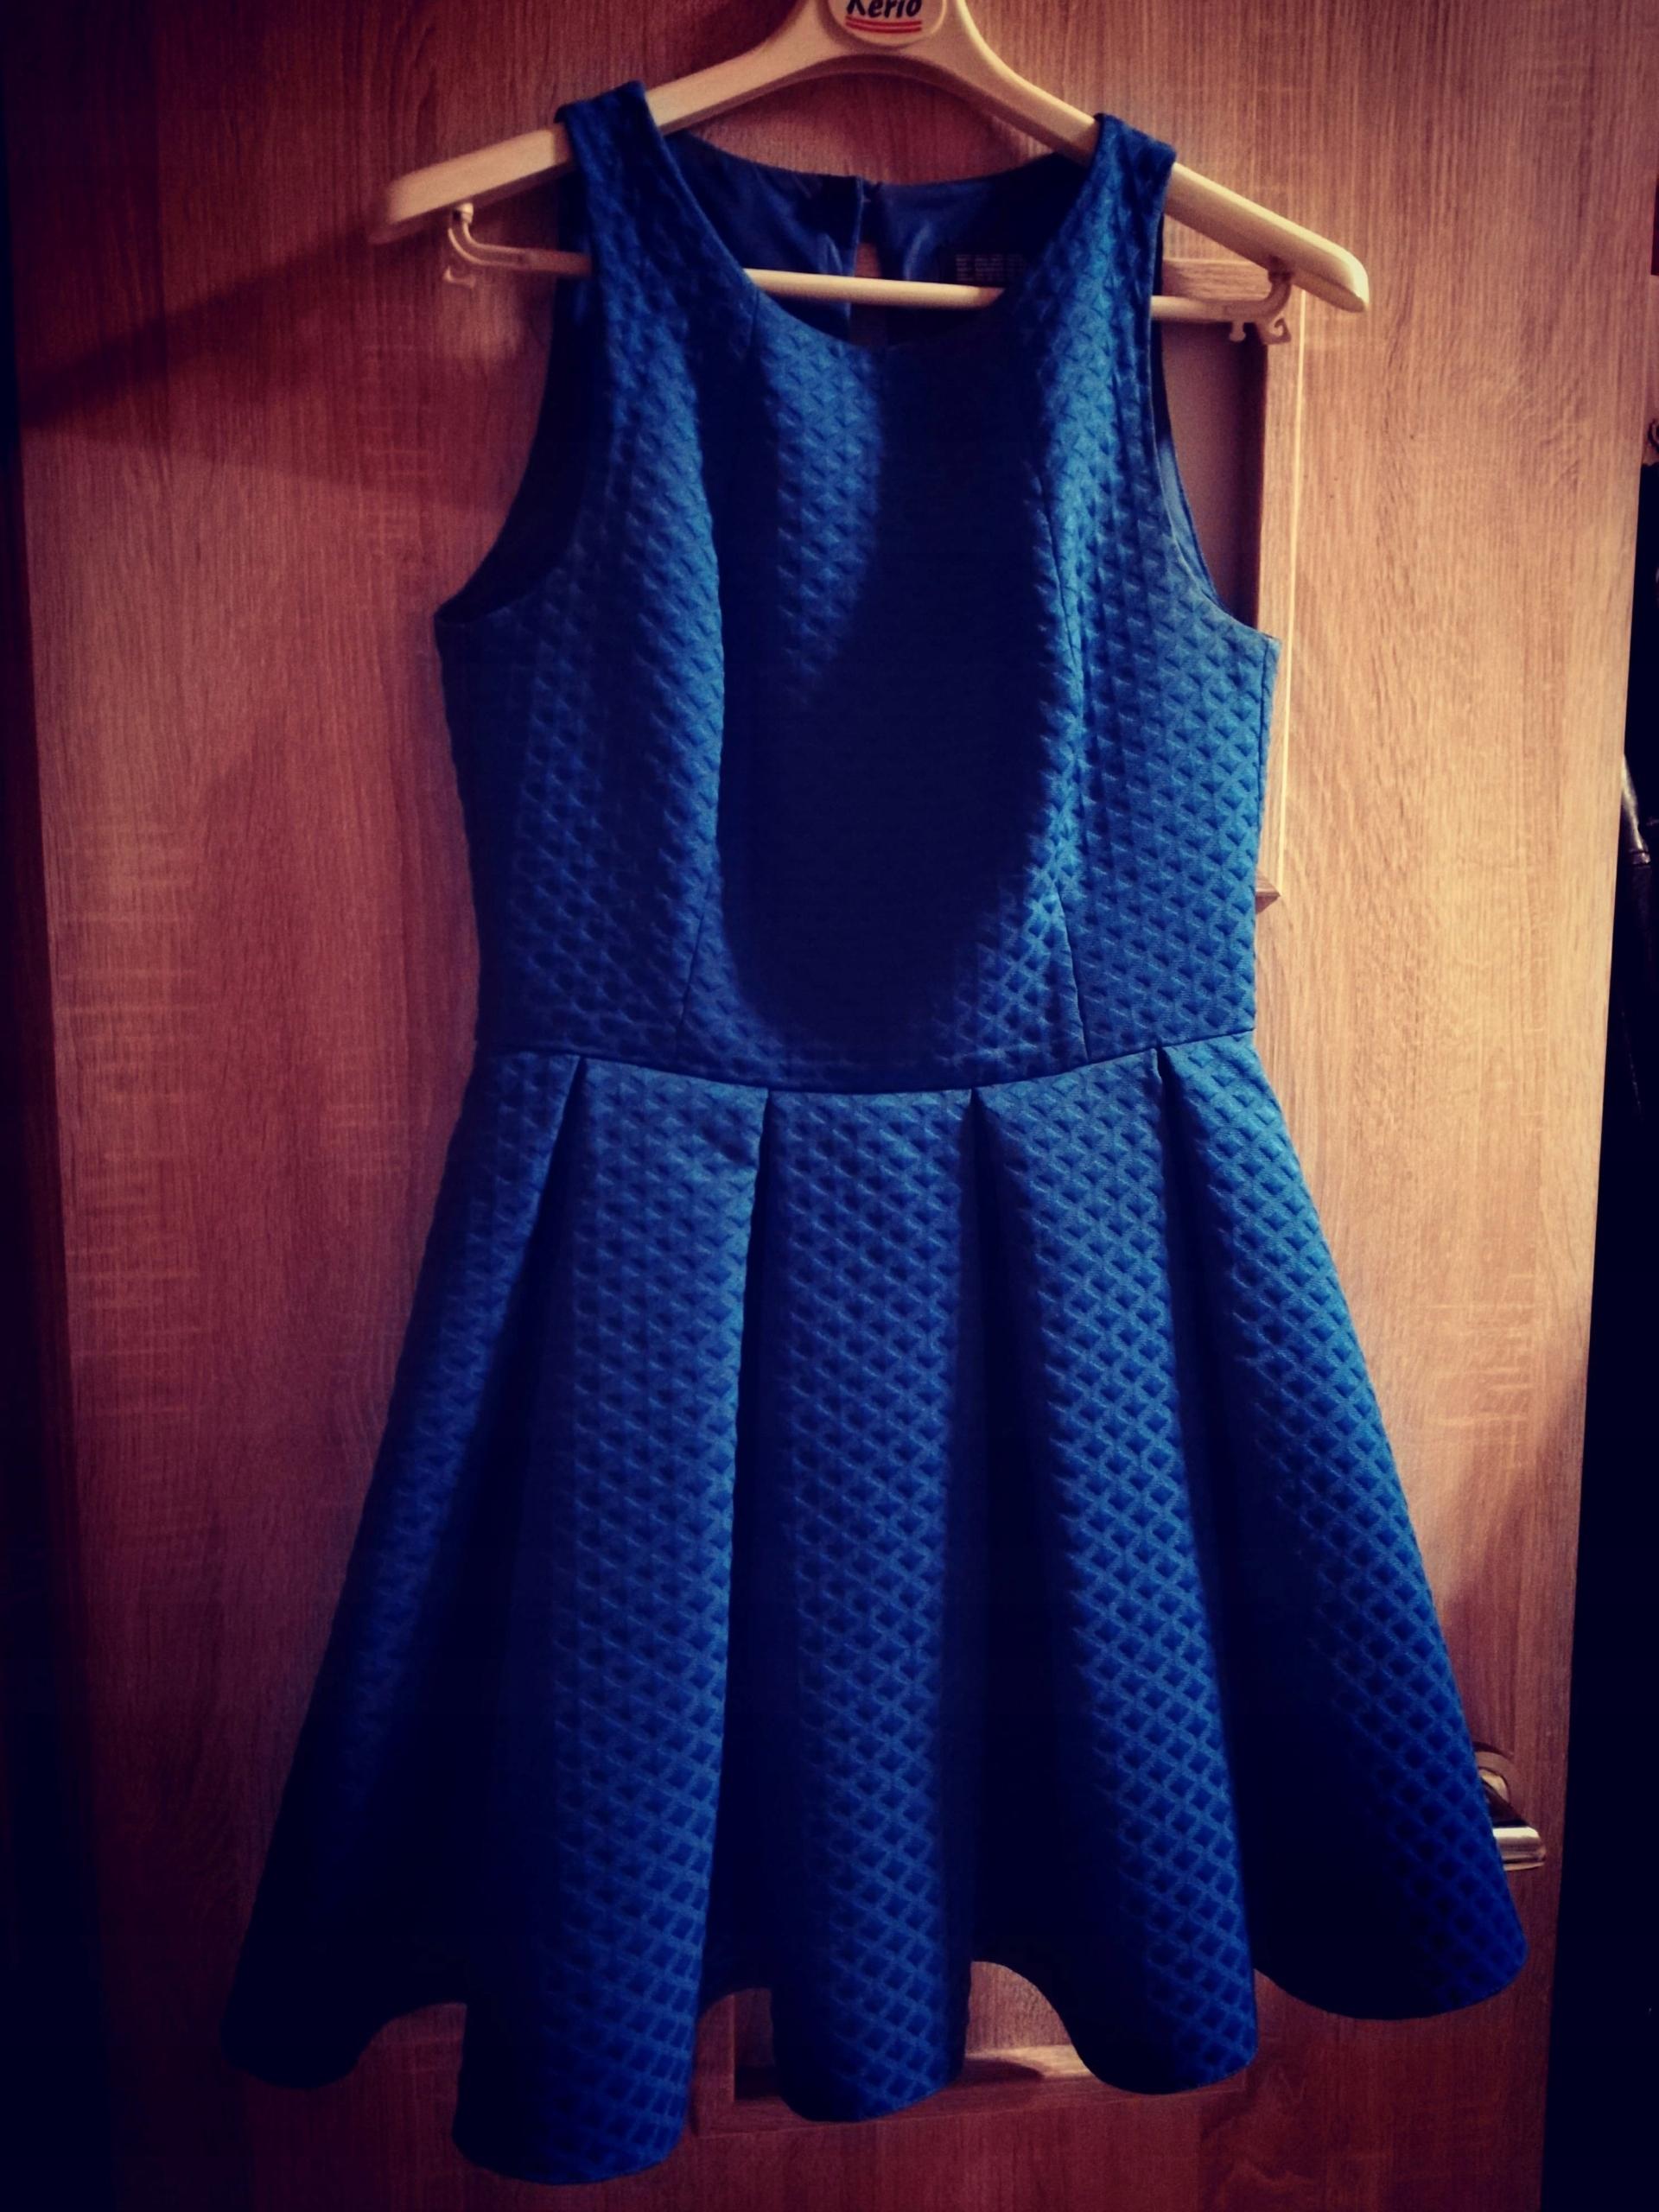 9e4ccb4e99 Sukienka kobalt MANGO H M ZARA kobaltowa 36 38 - 7603077678 ...